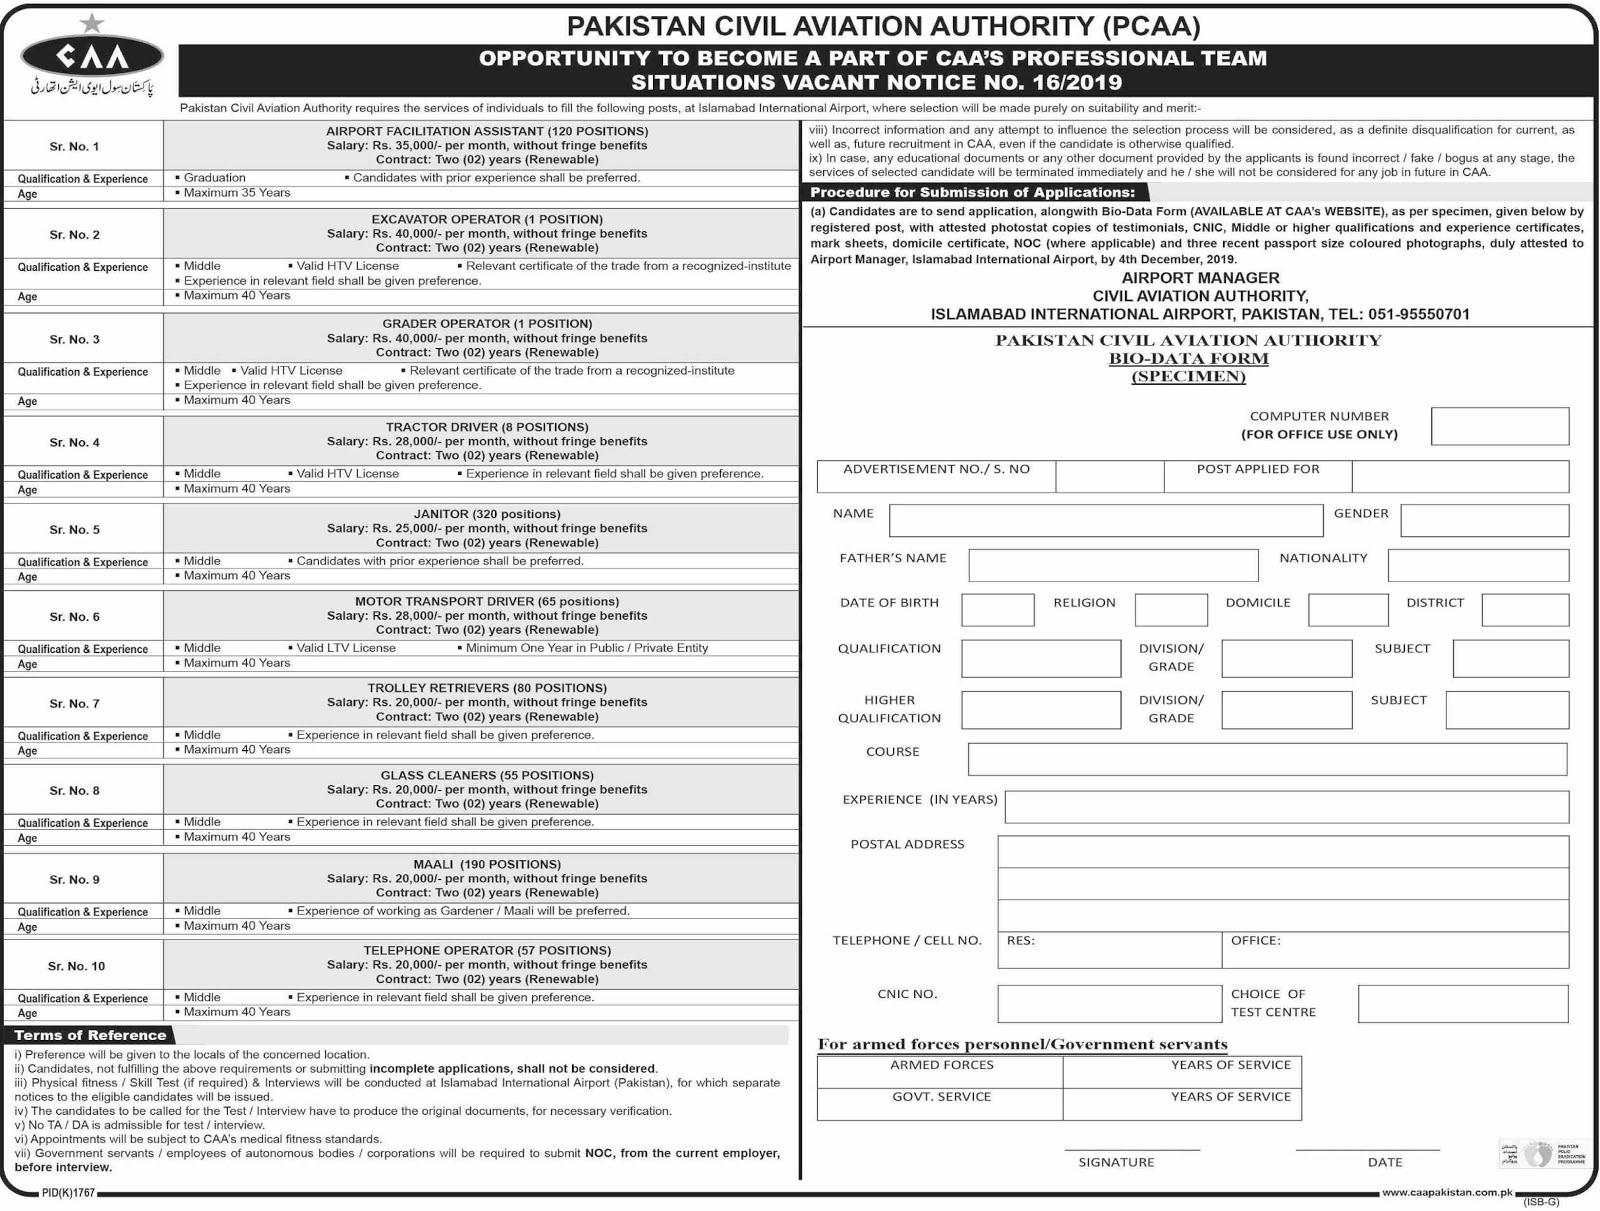 900+Vacancy in Pakistan Civil Aviation Authority PCAA Jobs 2019